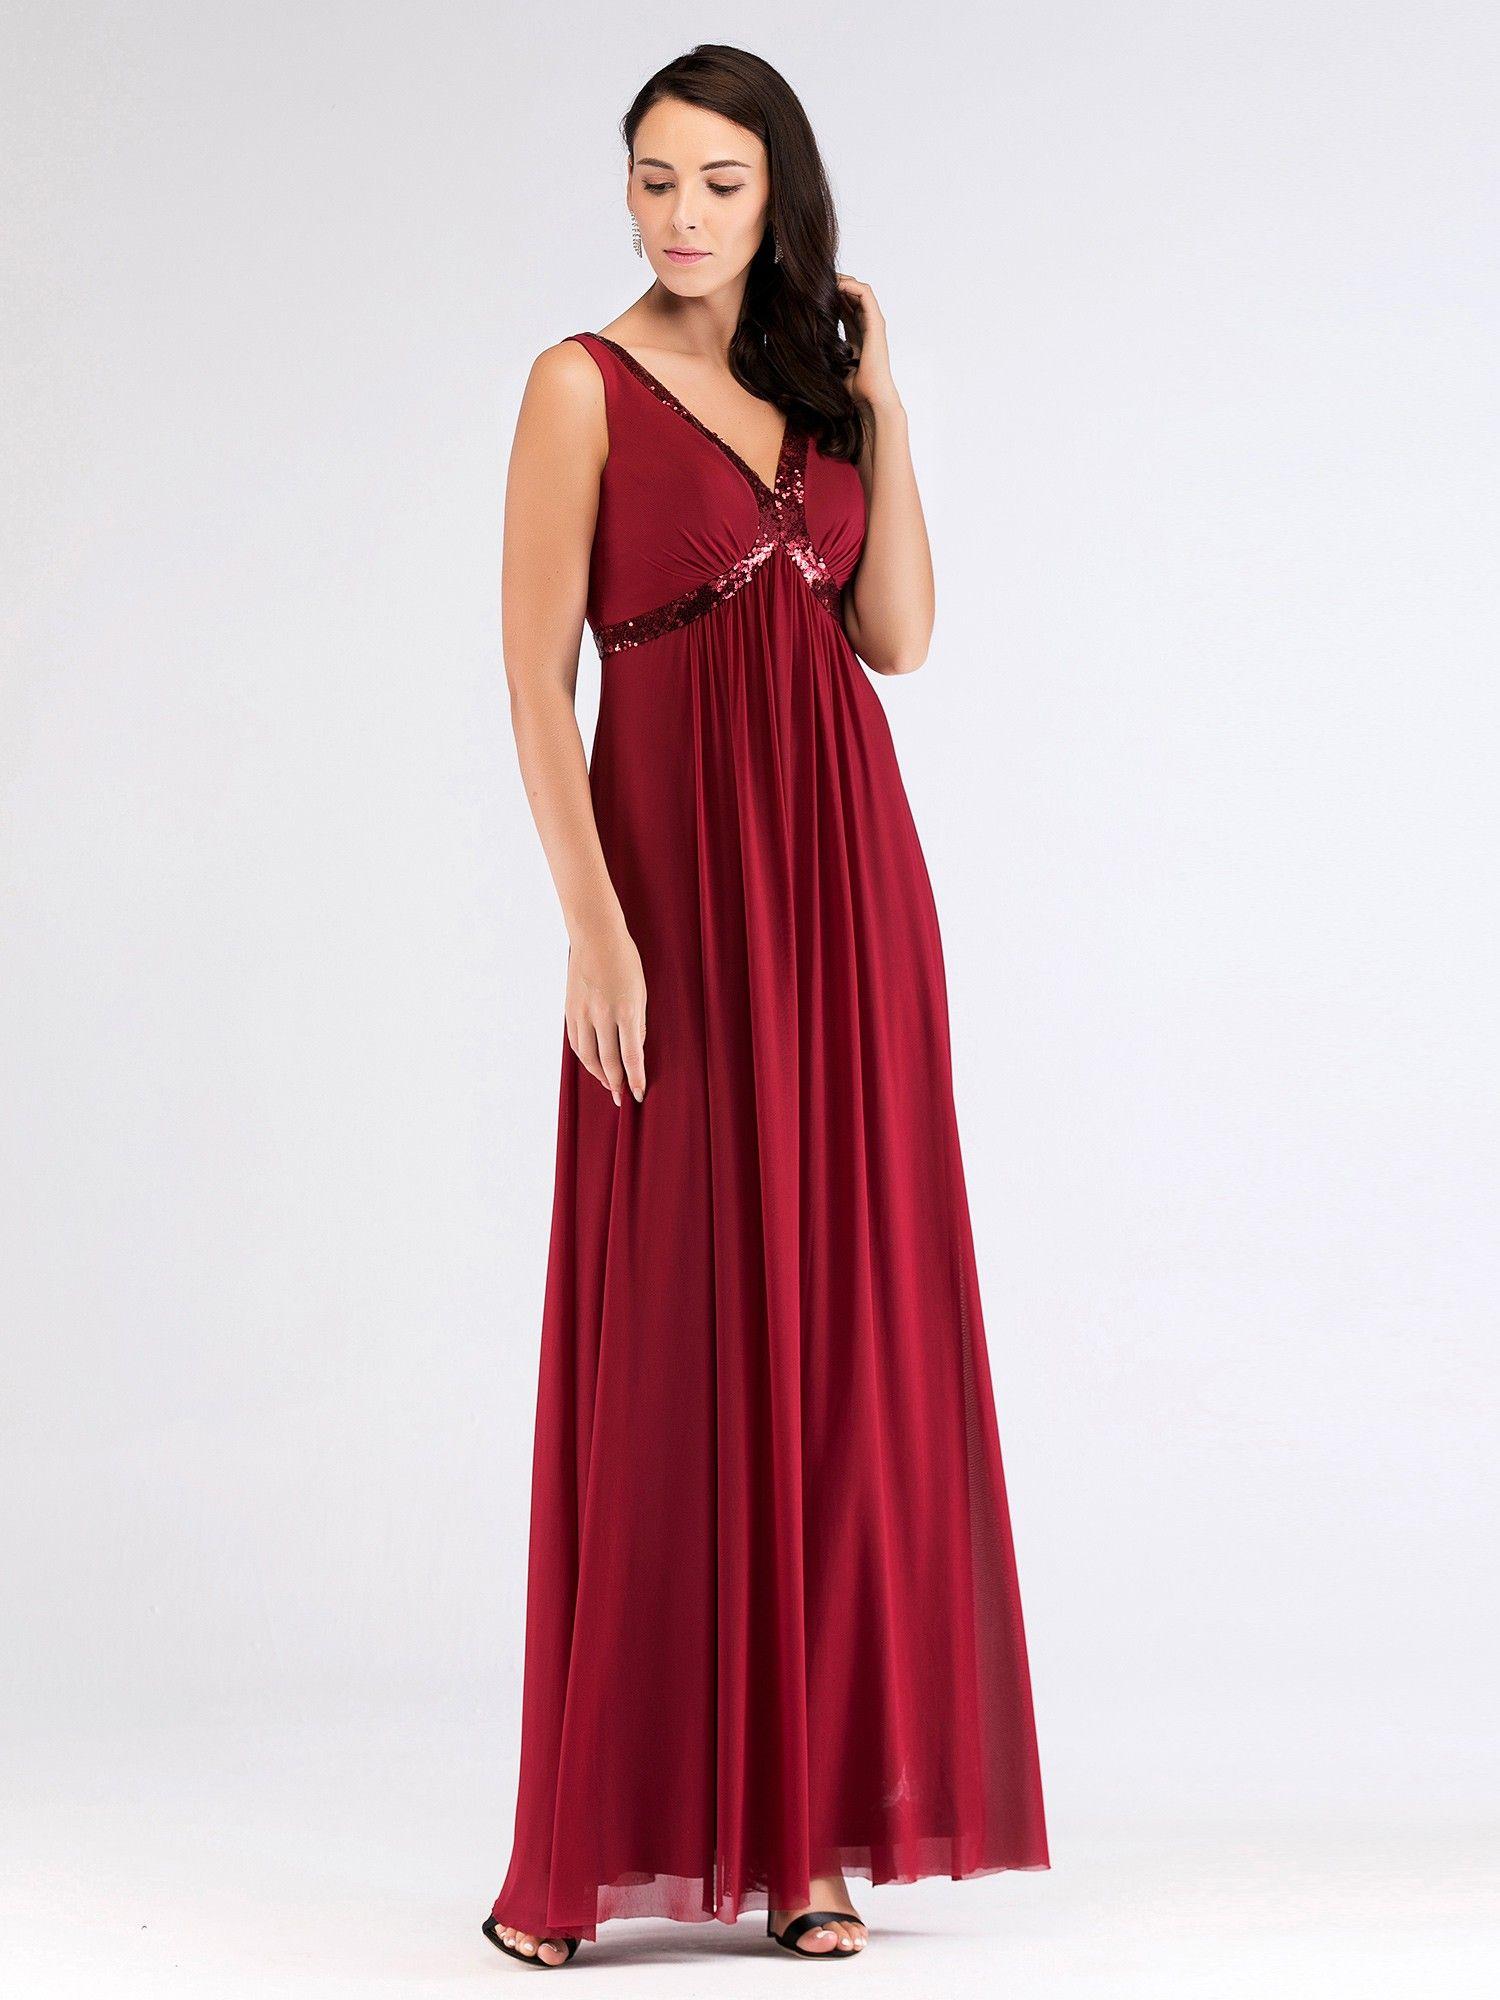 Floor Length Burgundy Evening Dress with Sequins   Ever ...